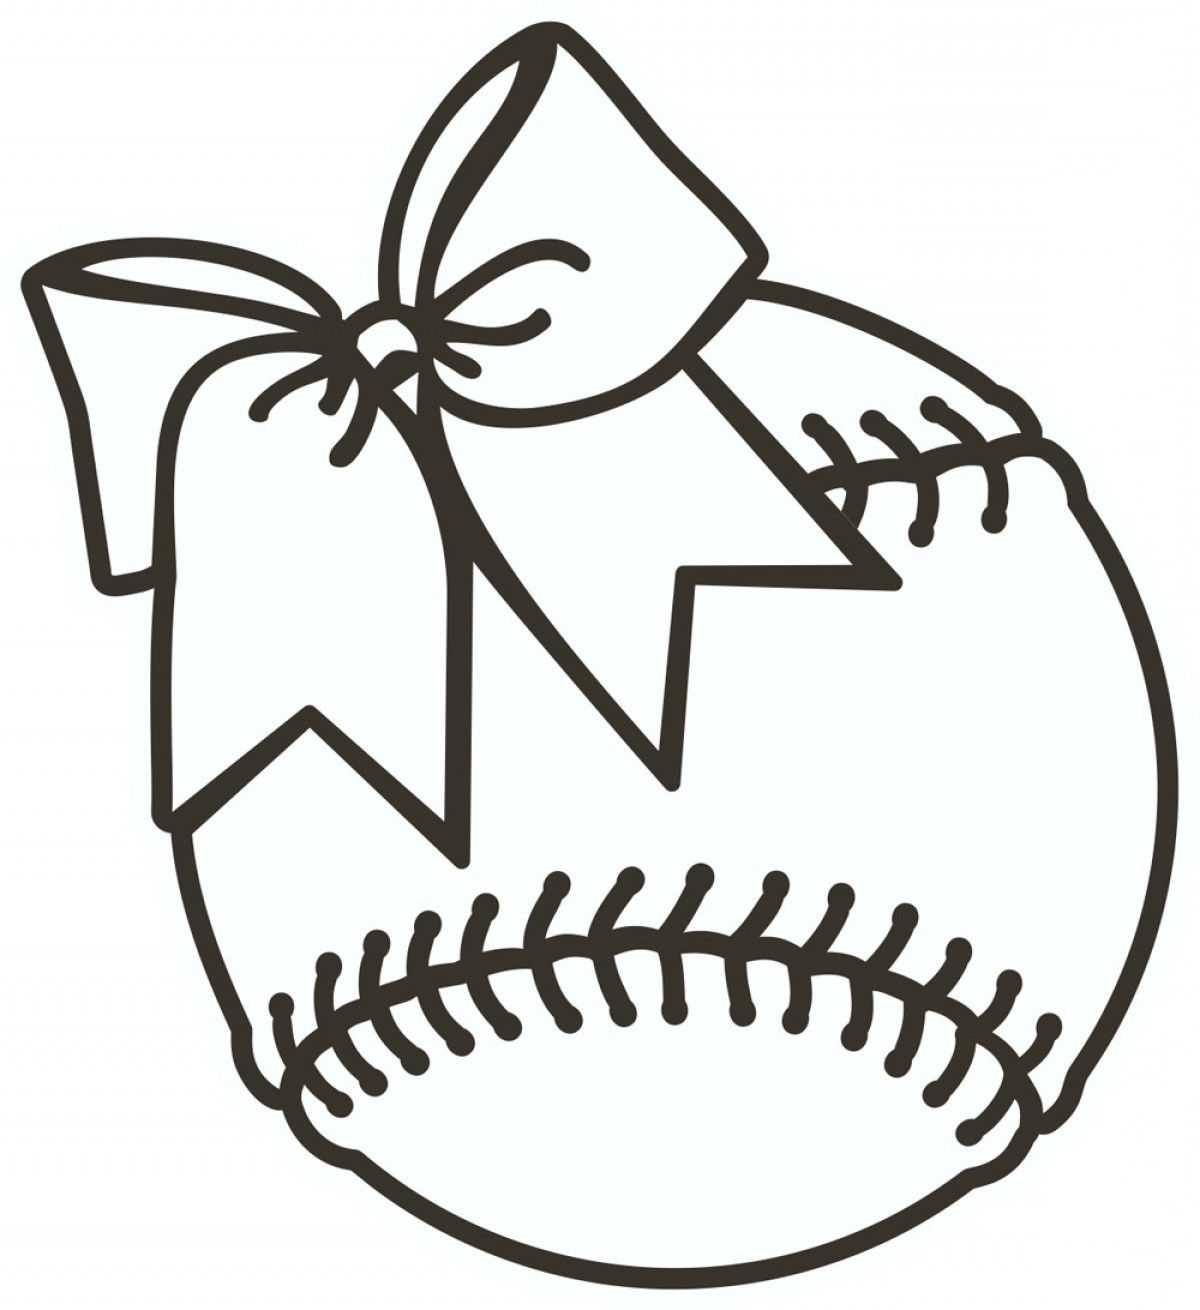 Softball Clipart Black And White.